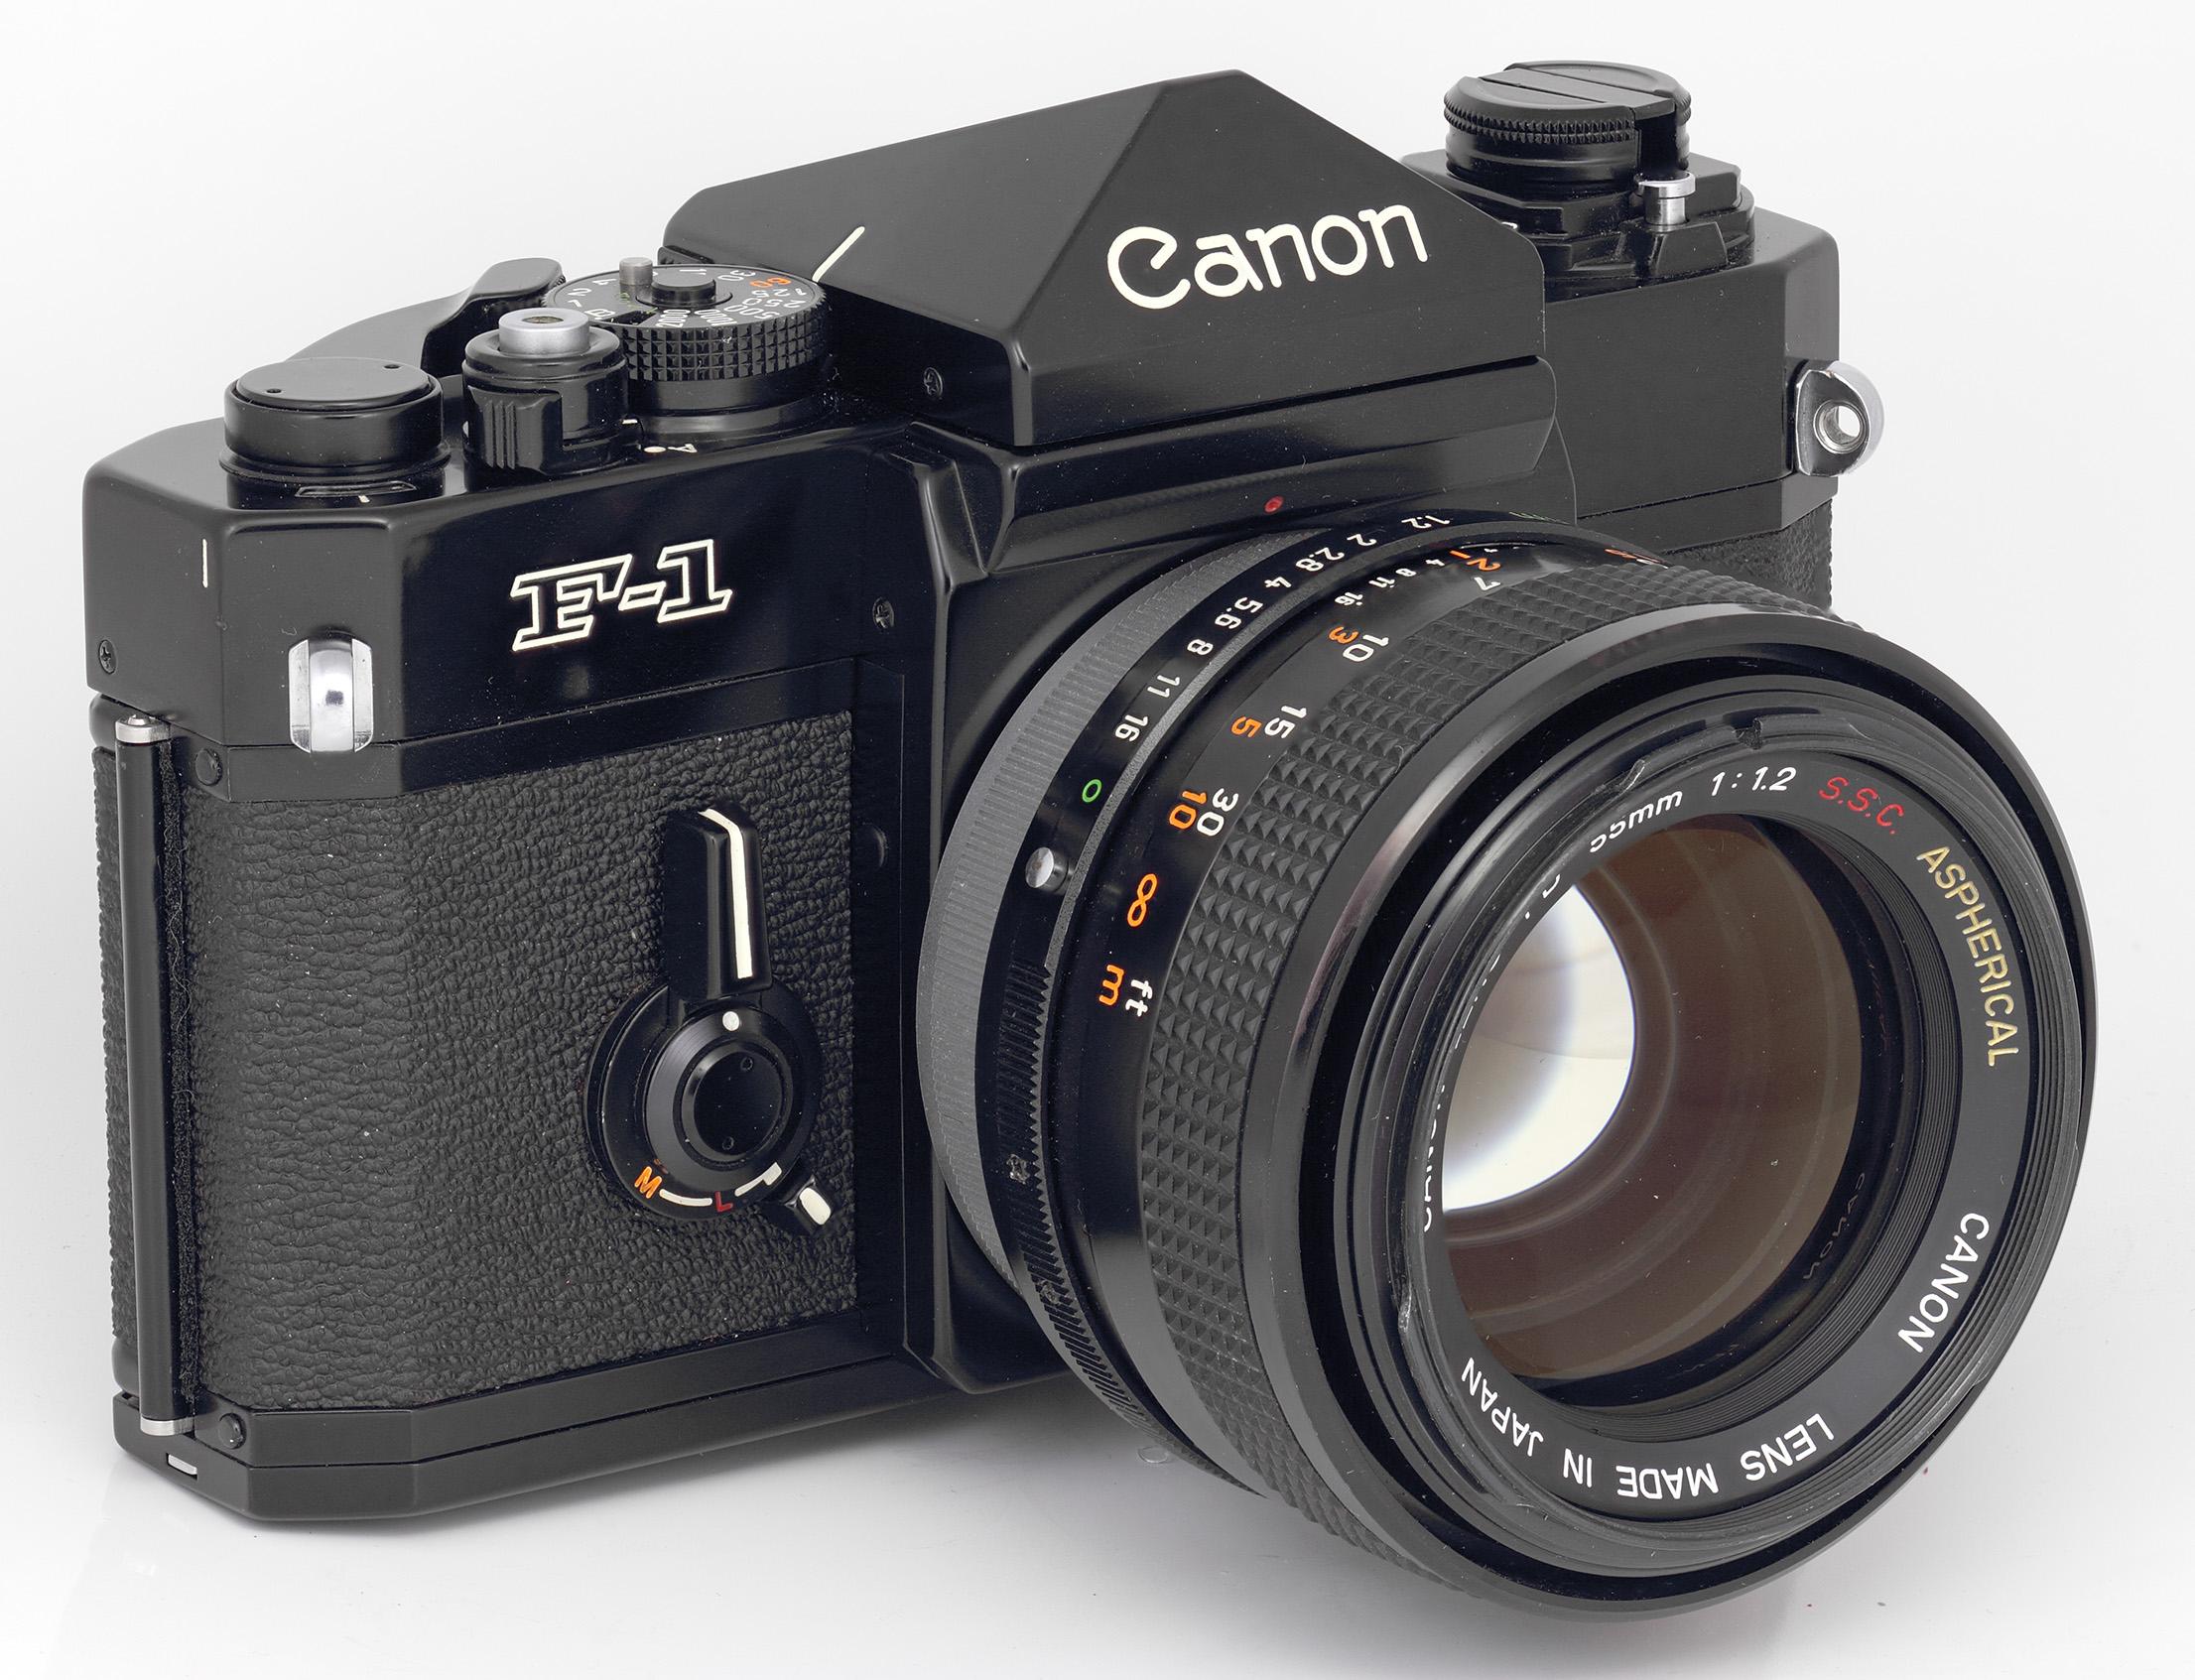 Canon FD Body /& Rear Lens Cap Protector Set for FD FL mount cameras and lenses